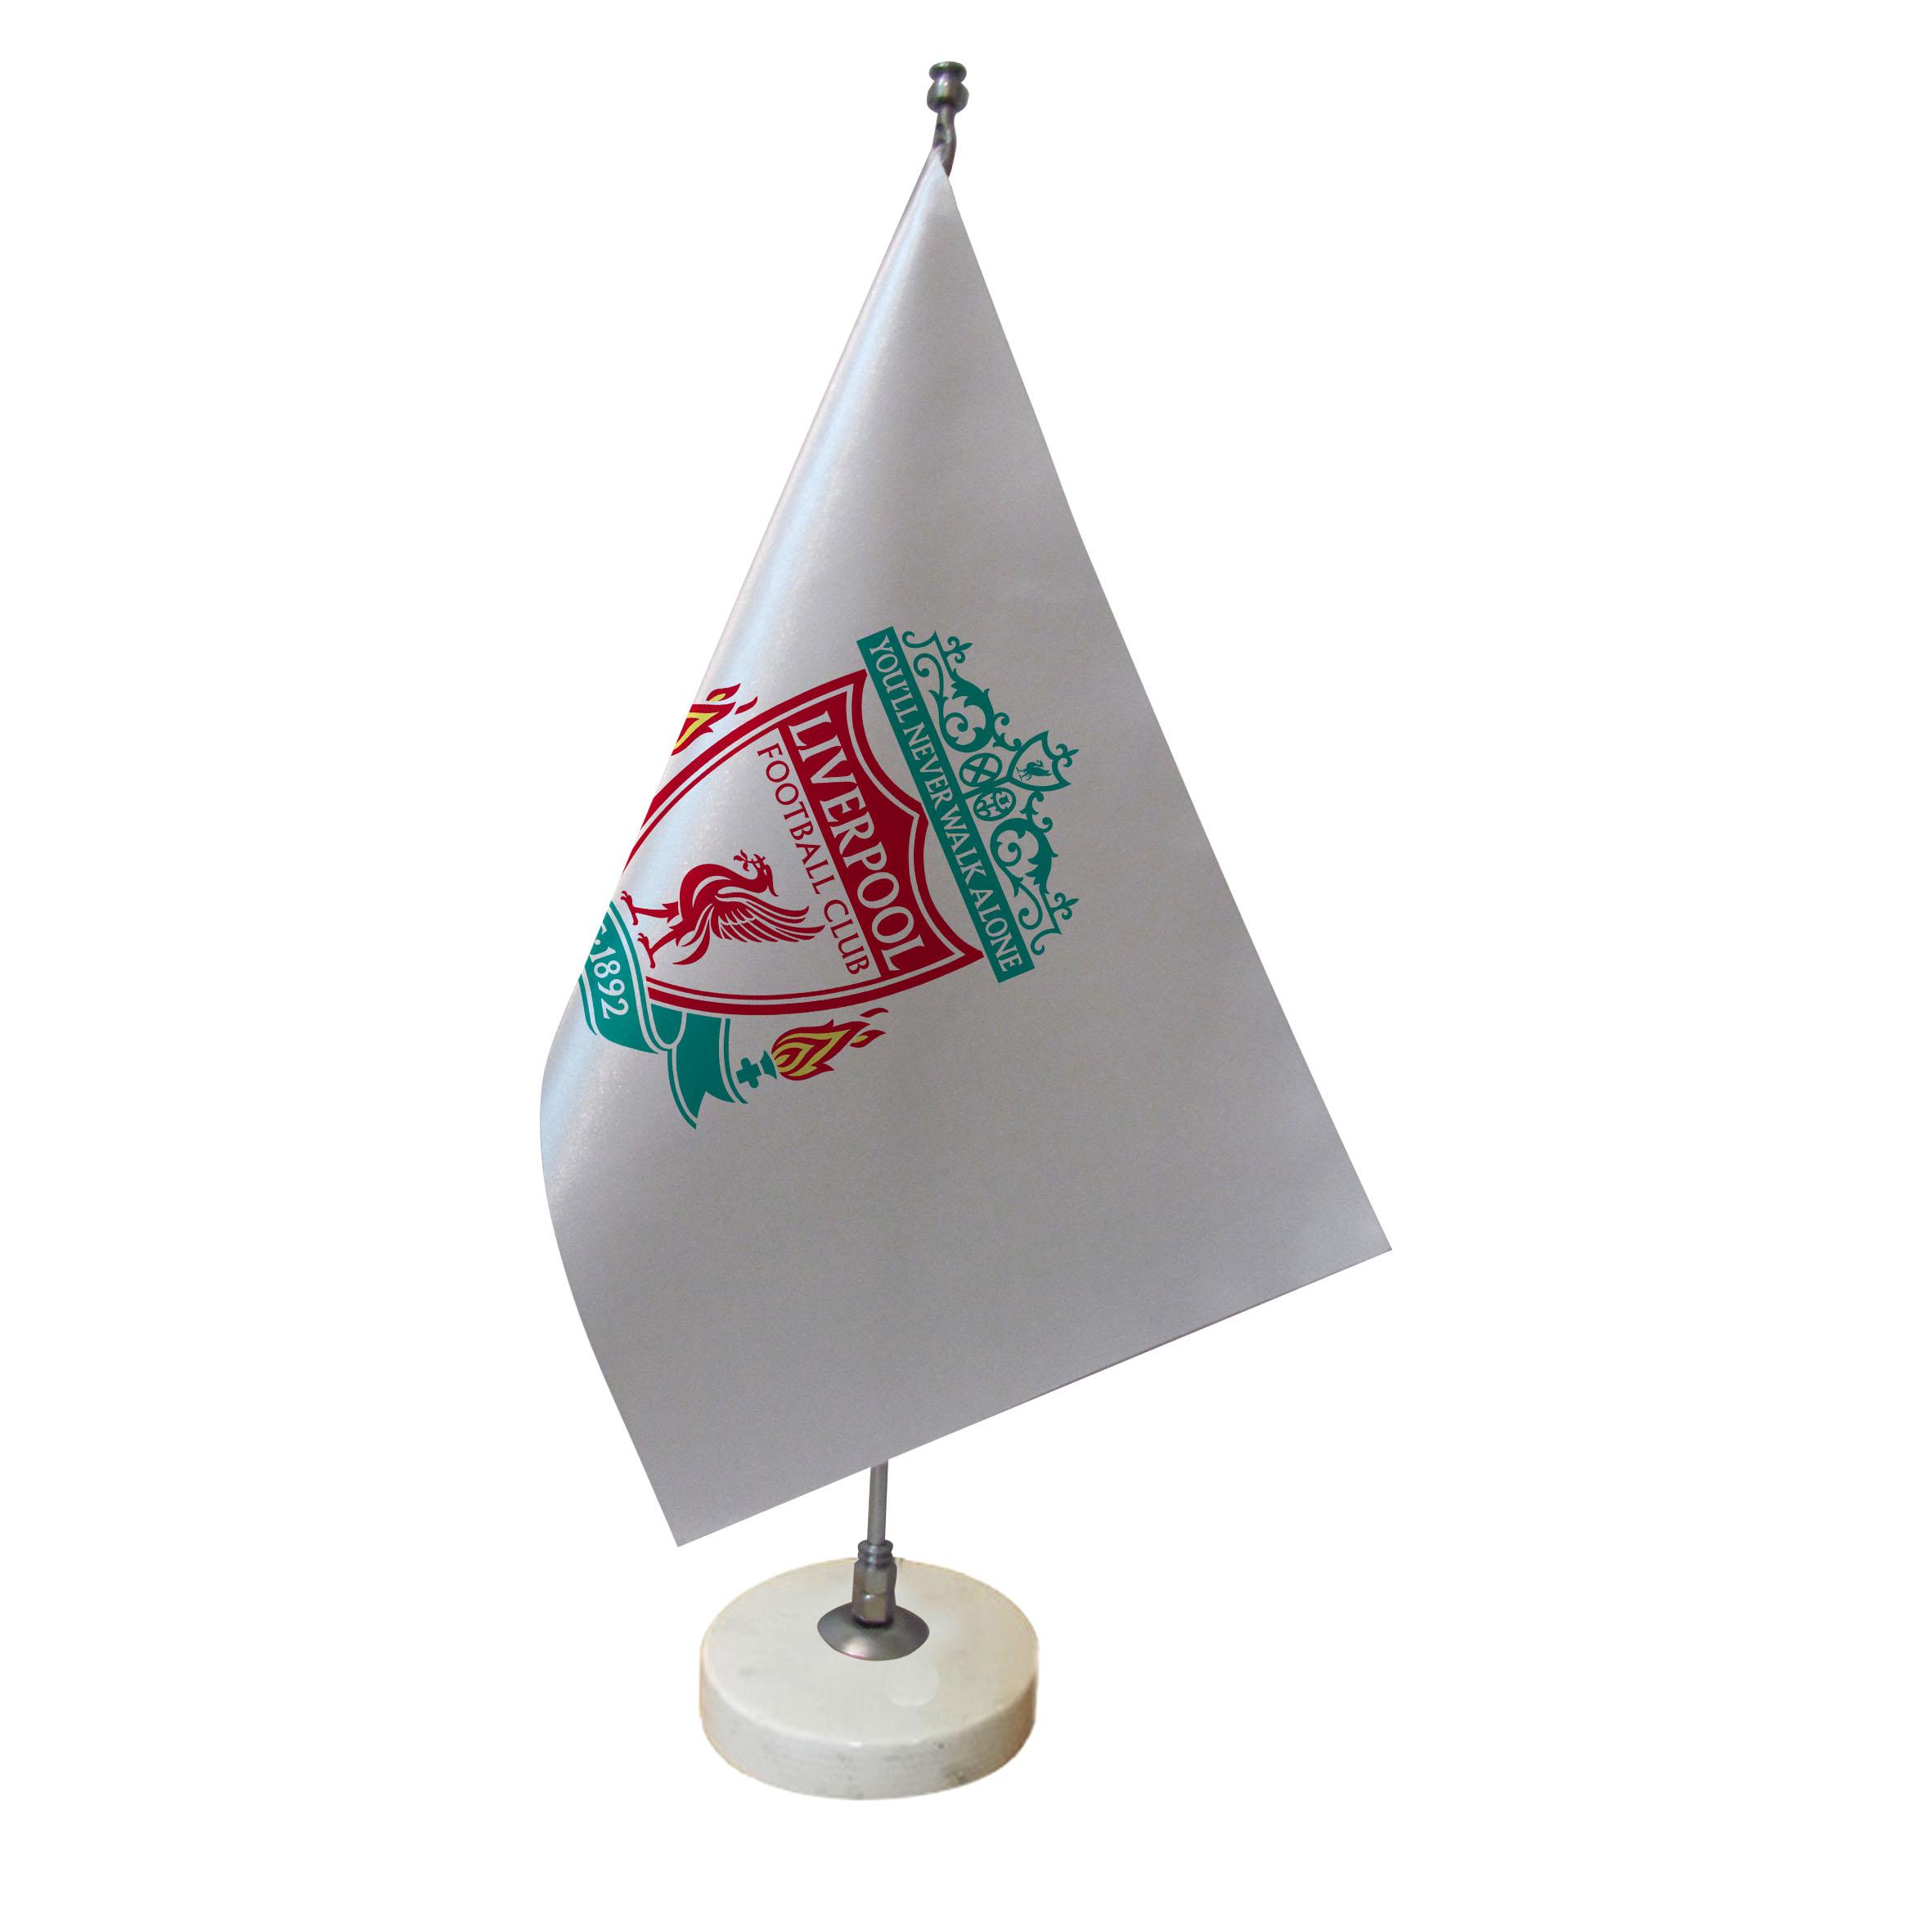 پرچم رومیزی طرح تیم فوتبال لیورپول کد pr28